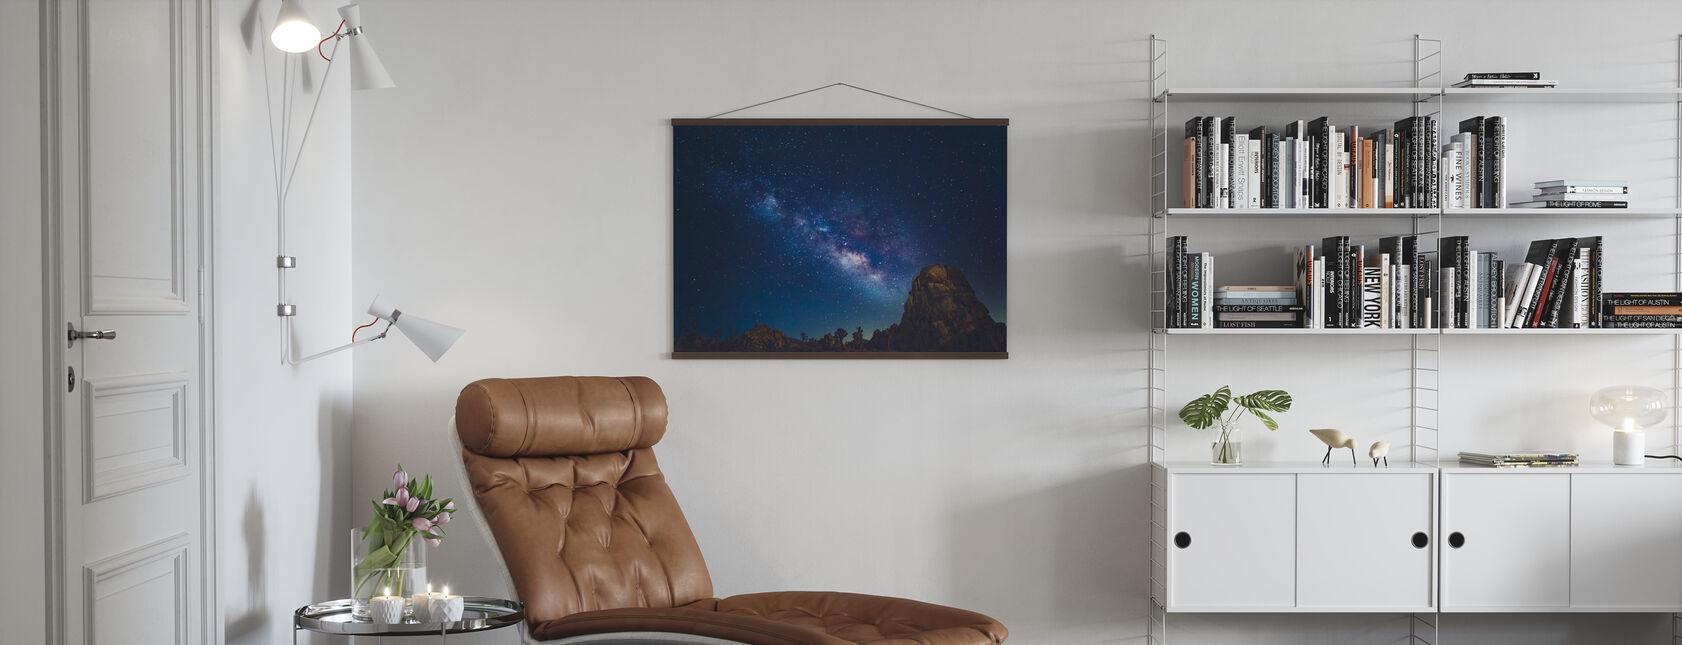 Stars of Joshua Tree, California - Poster - Living Room